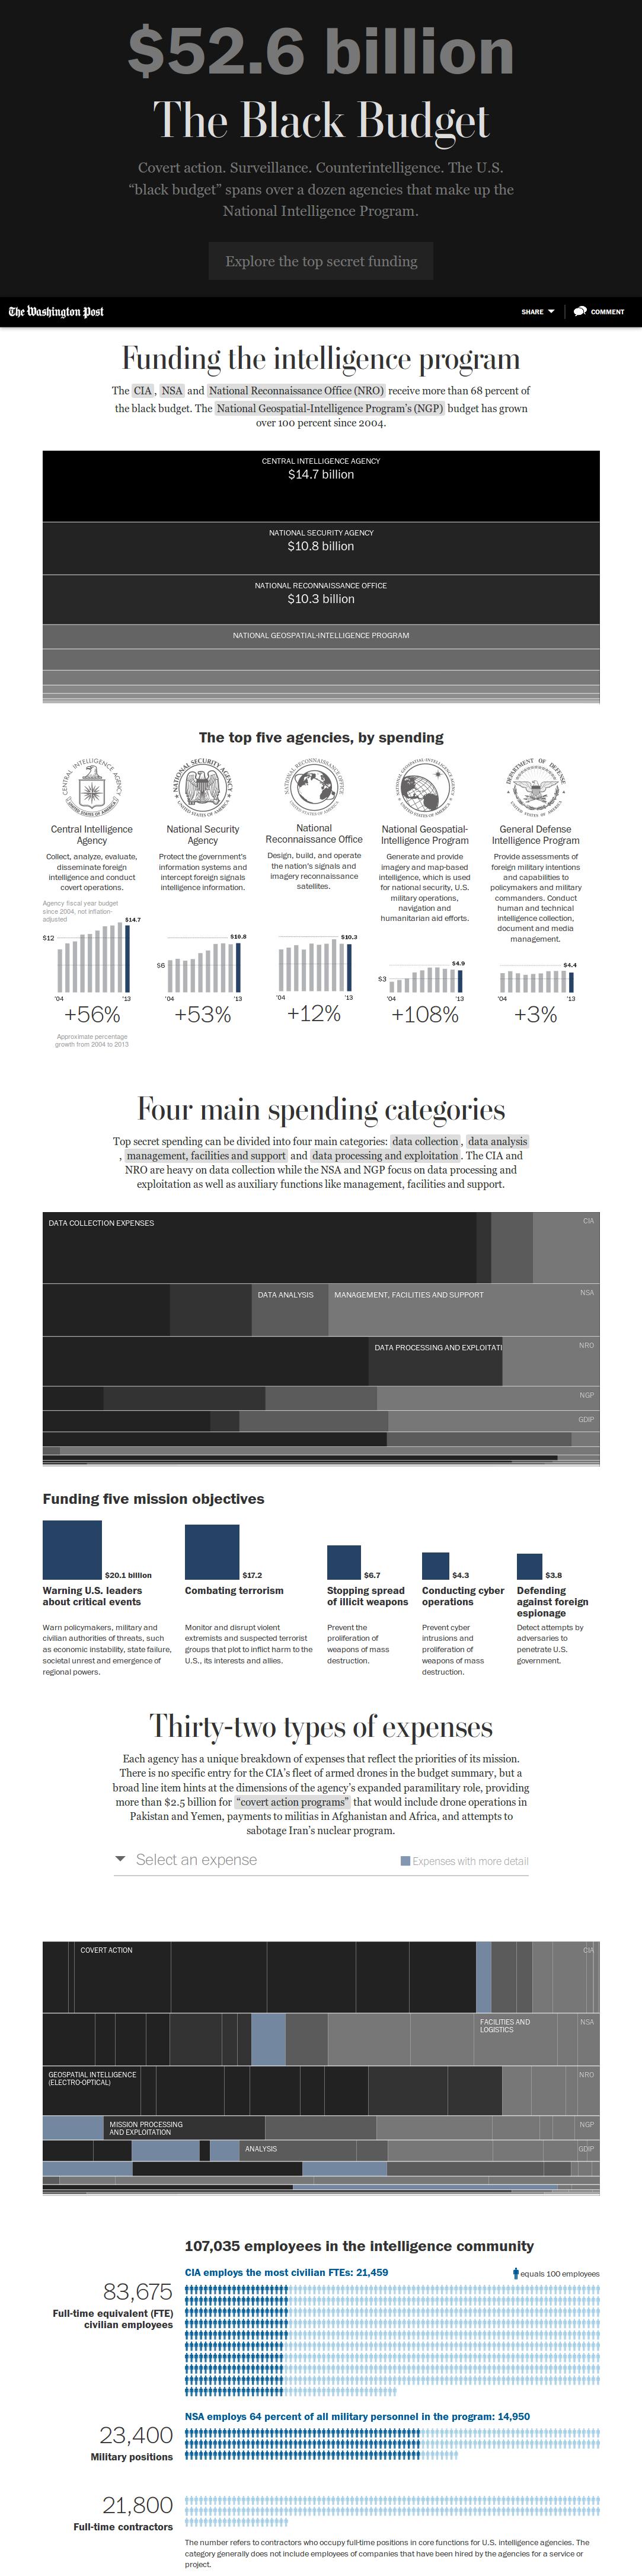 The Black Budget